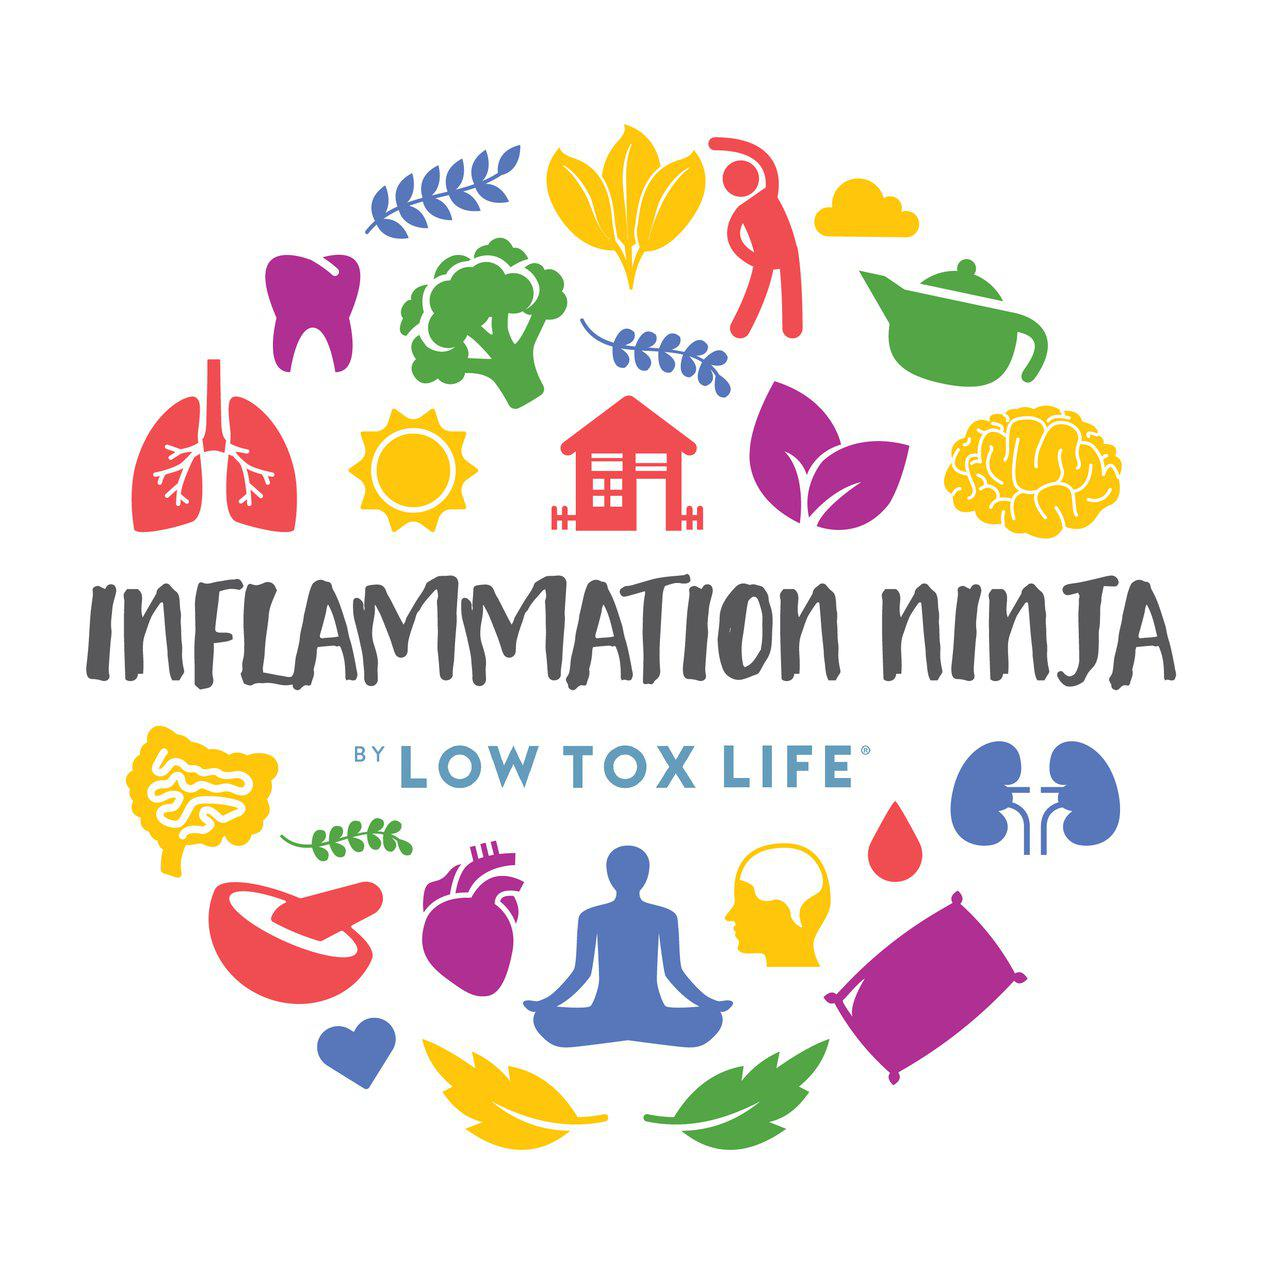 Inflammation Ninja